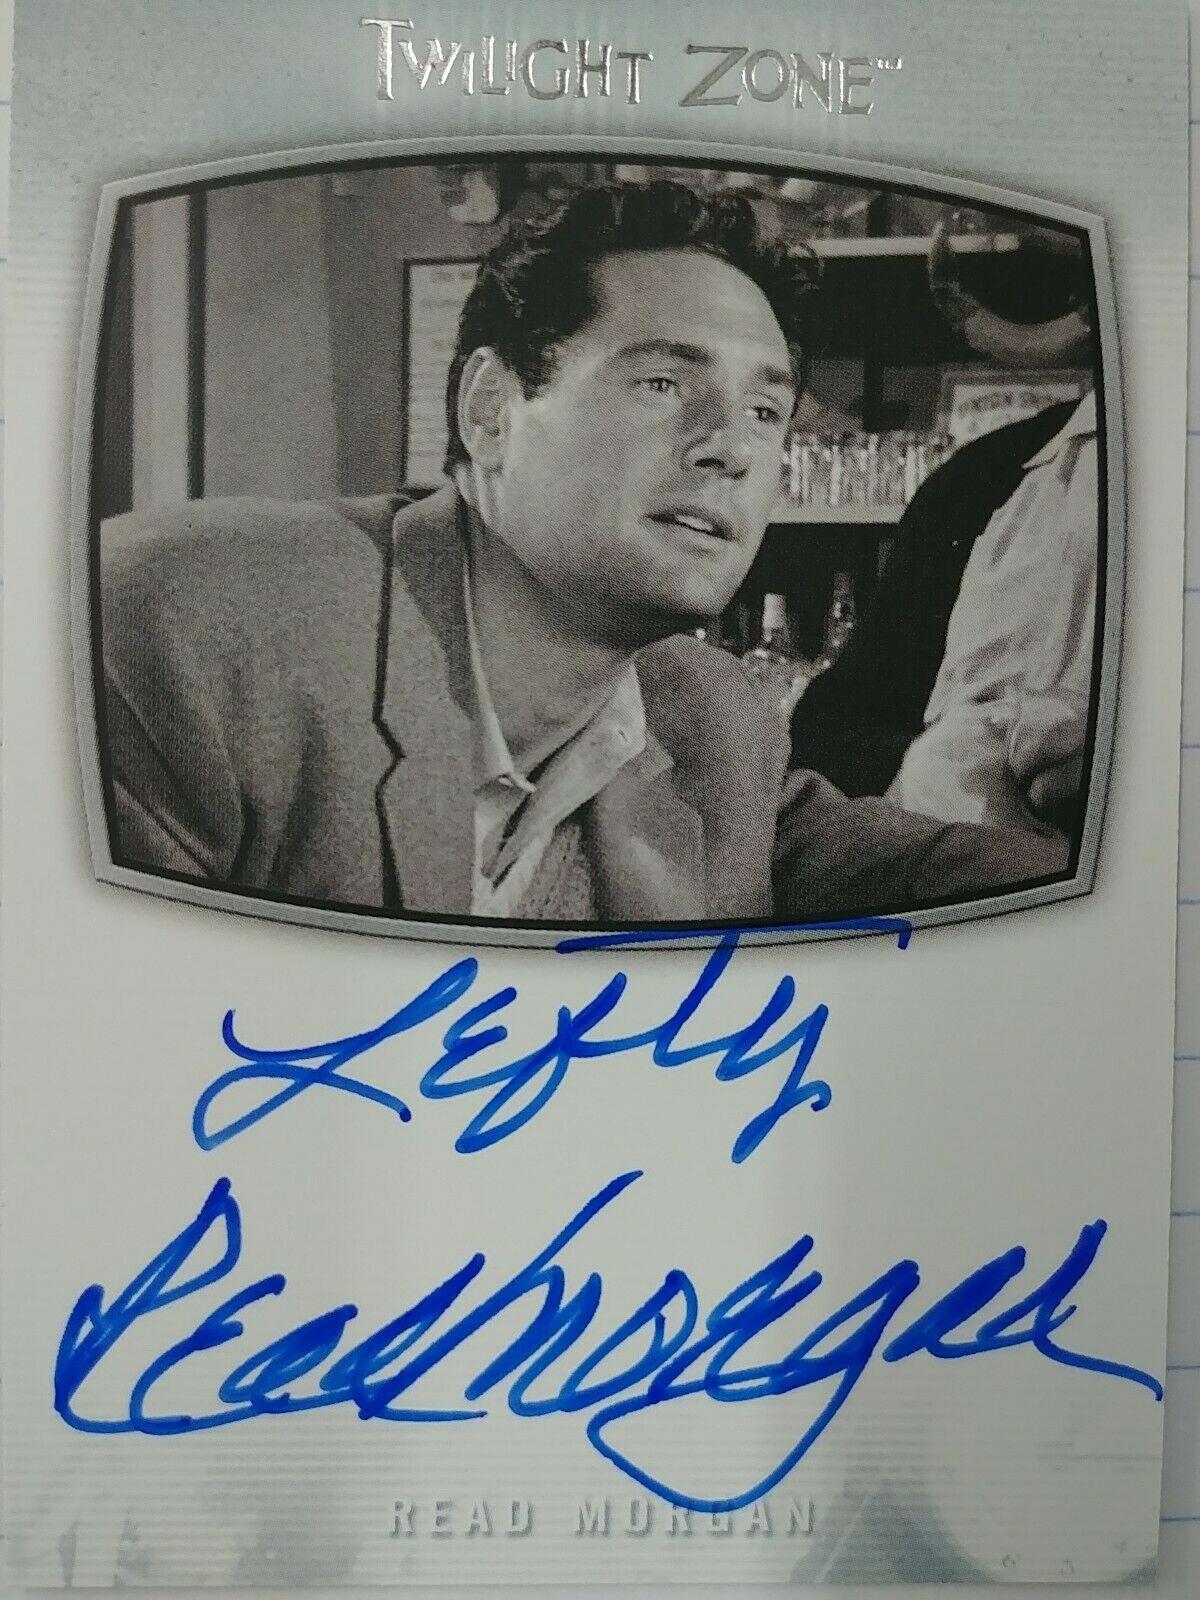 Twilight Zone Season 4 Auto Autograph Card A-70 Don Durant